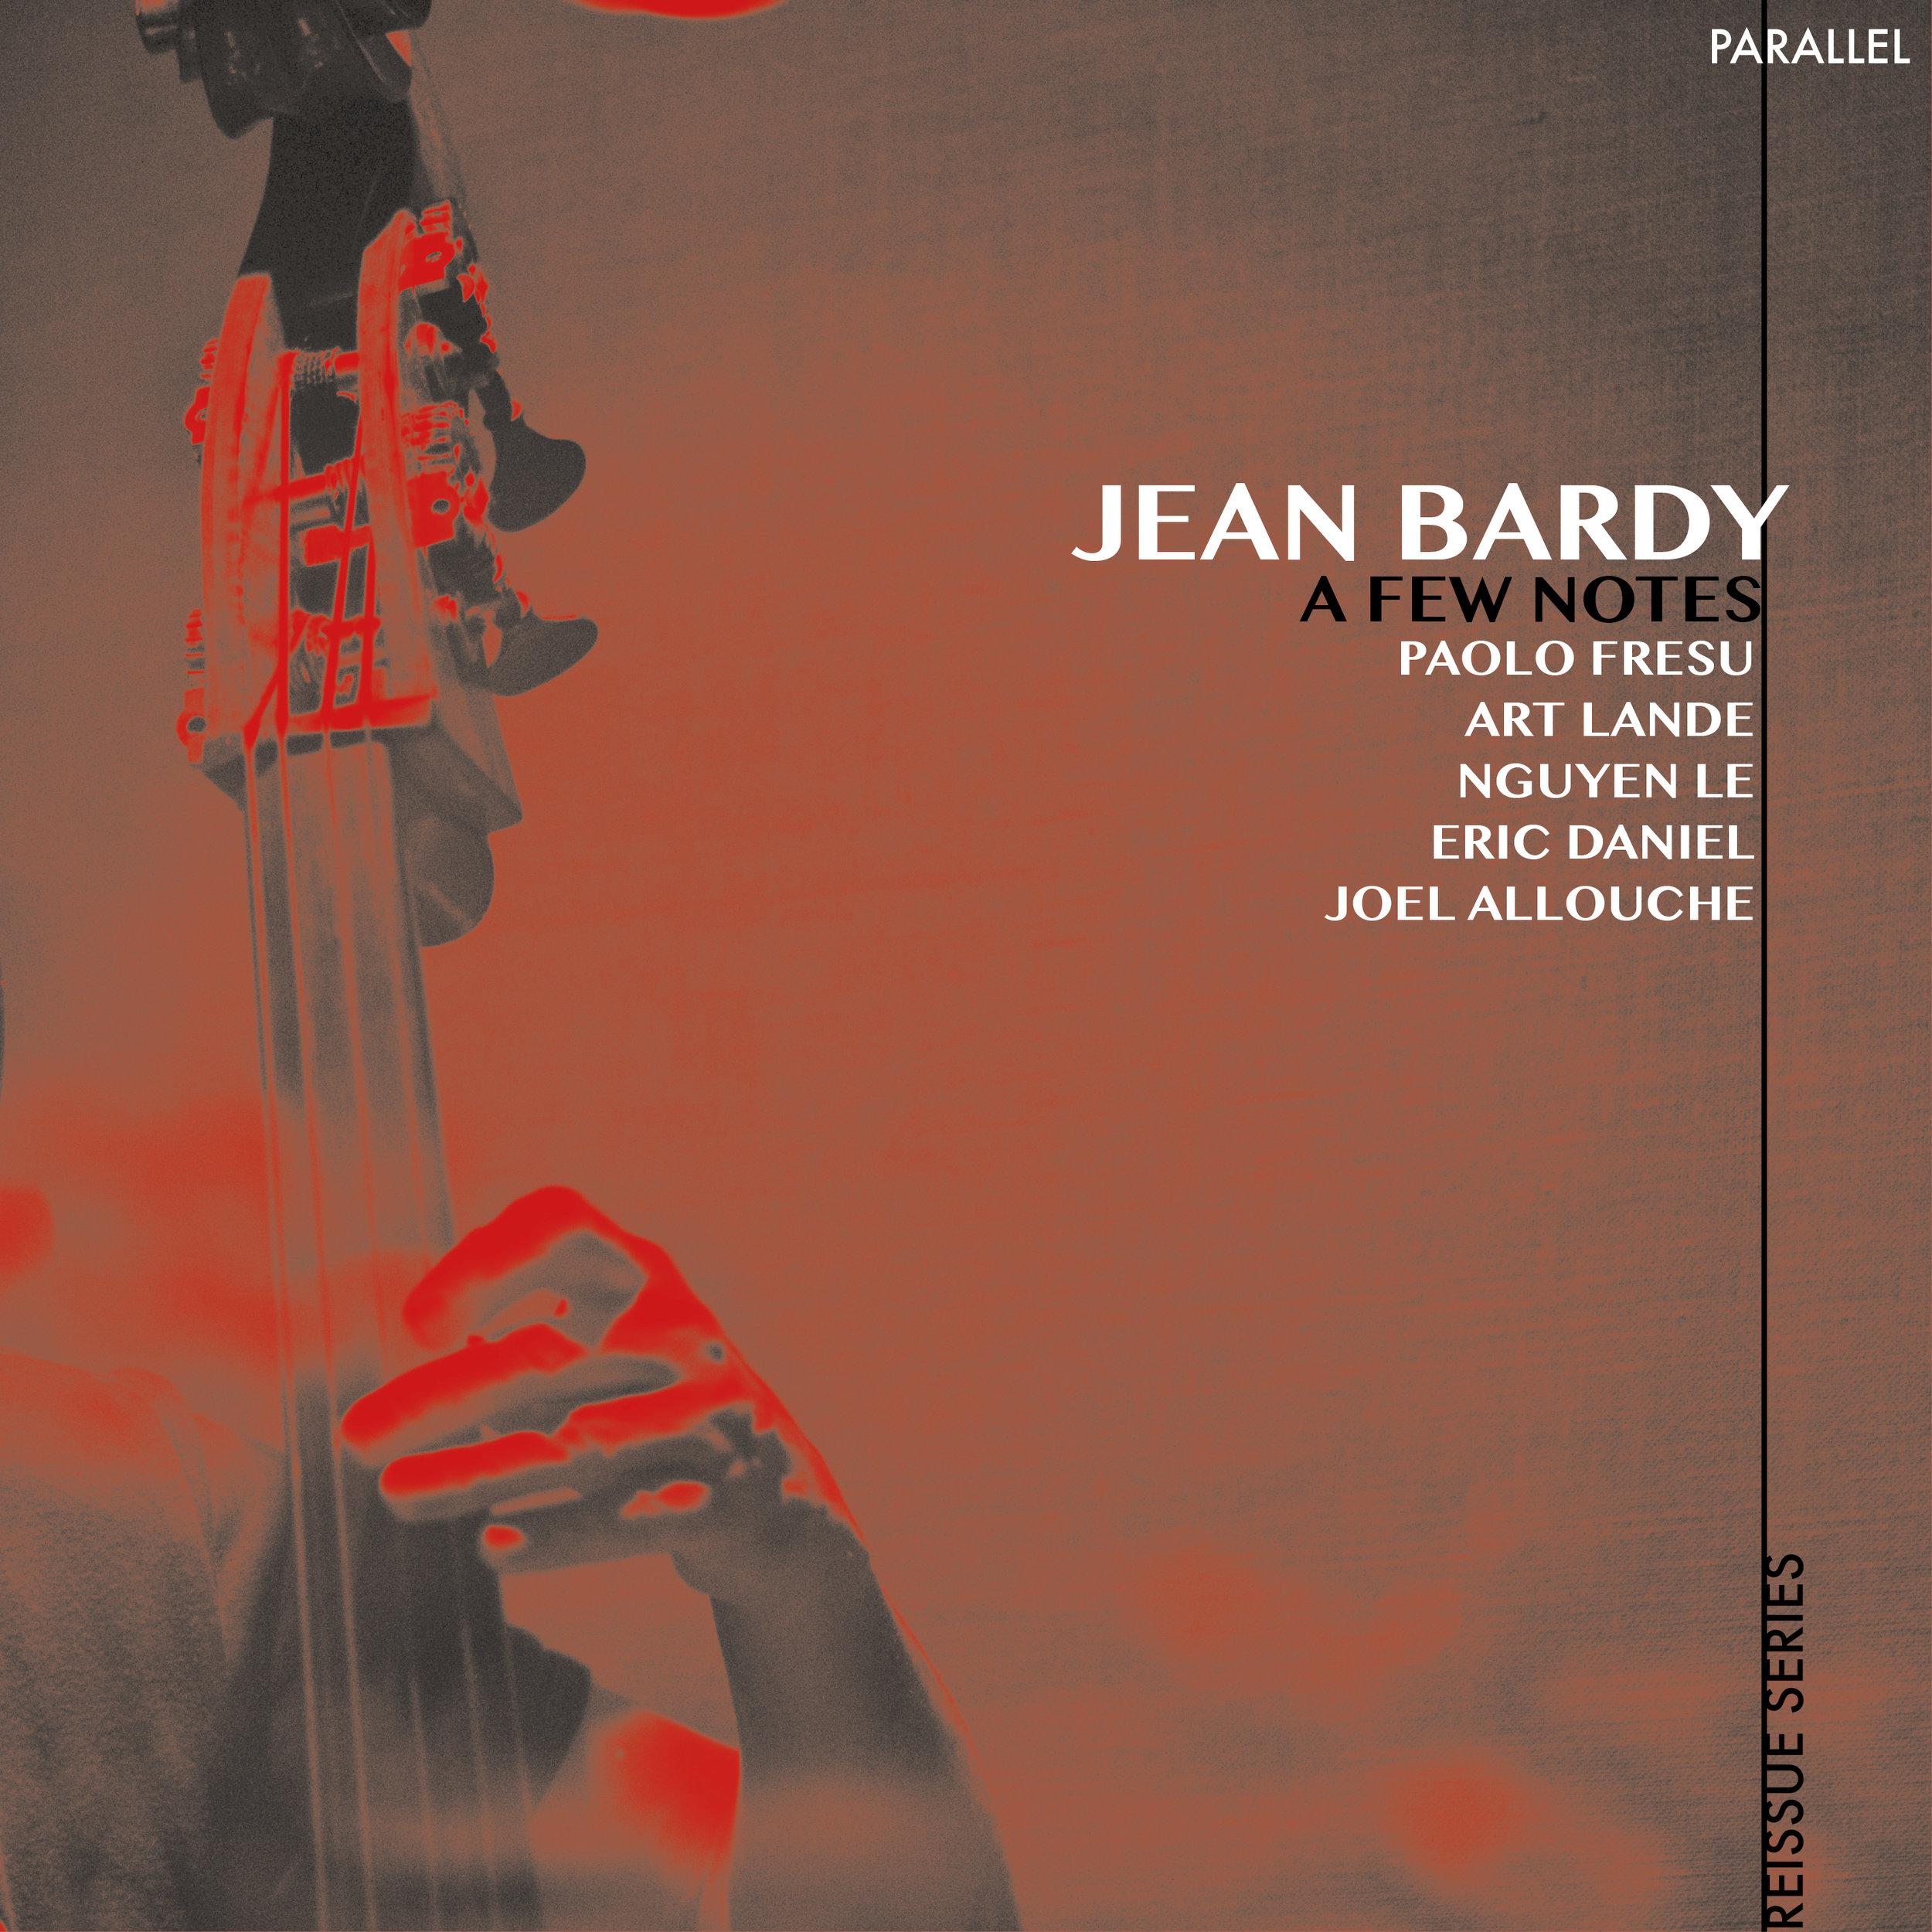 JEAN BARDY  - A FEW NOTES...(1997/2017)